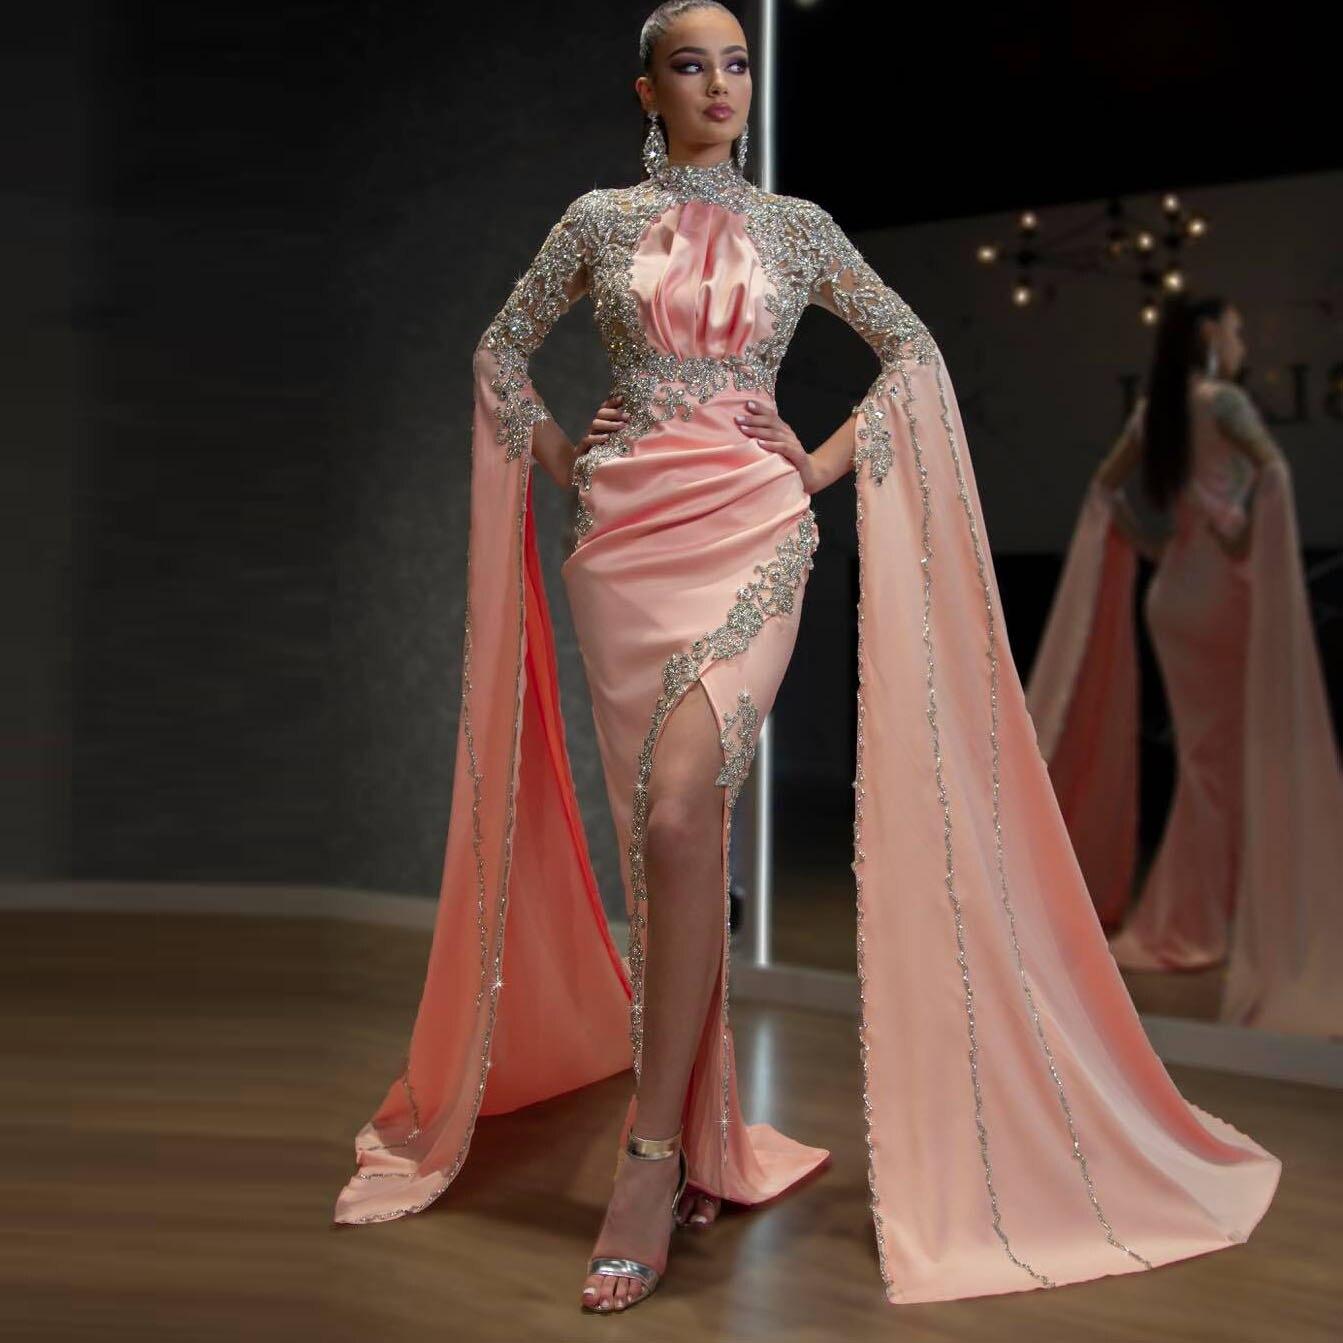 Abendkleider-فستان حفلة على شكل حورية البحر ، أنيق ، كريستال ، أكمام منتفخة طويلة ، مثير ، شق جانبي ، طويل ، دبي ، 2020